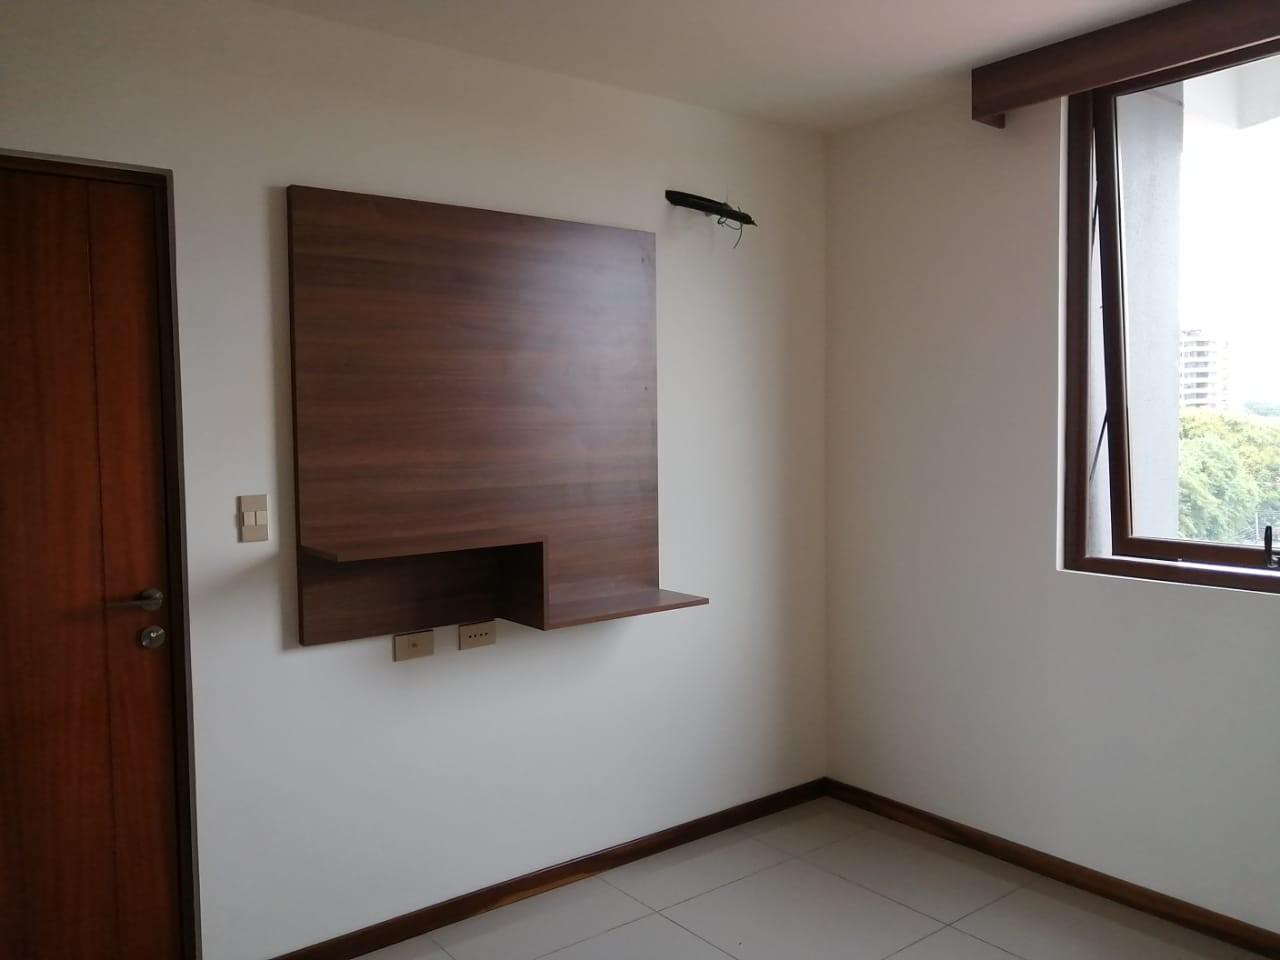 Departamento en Alquiler Edif. Macororó 11 - A Estrenar Dpto. 1 Dorm. Foto 6